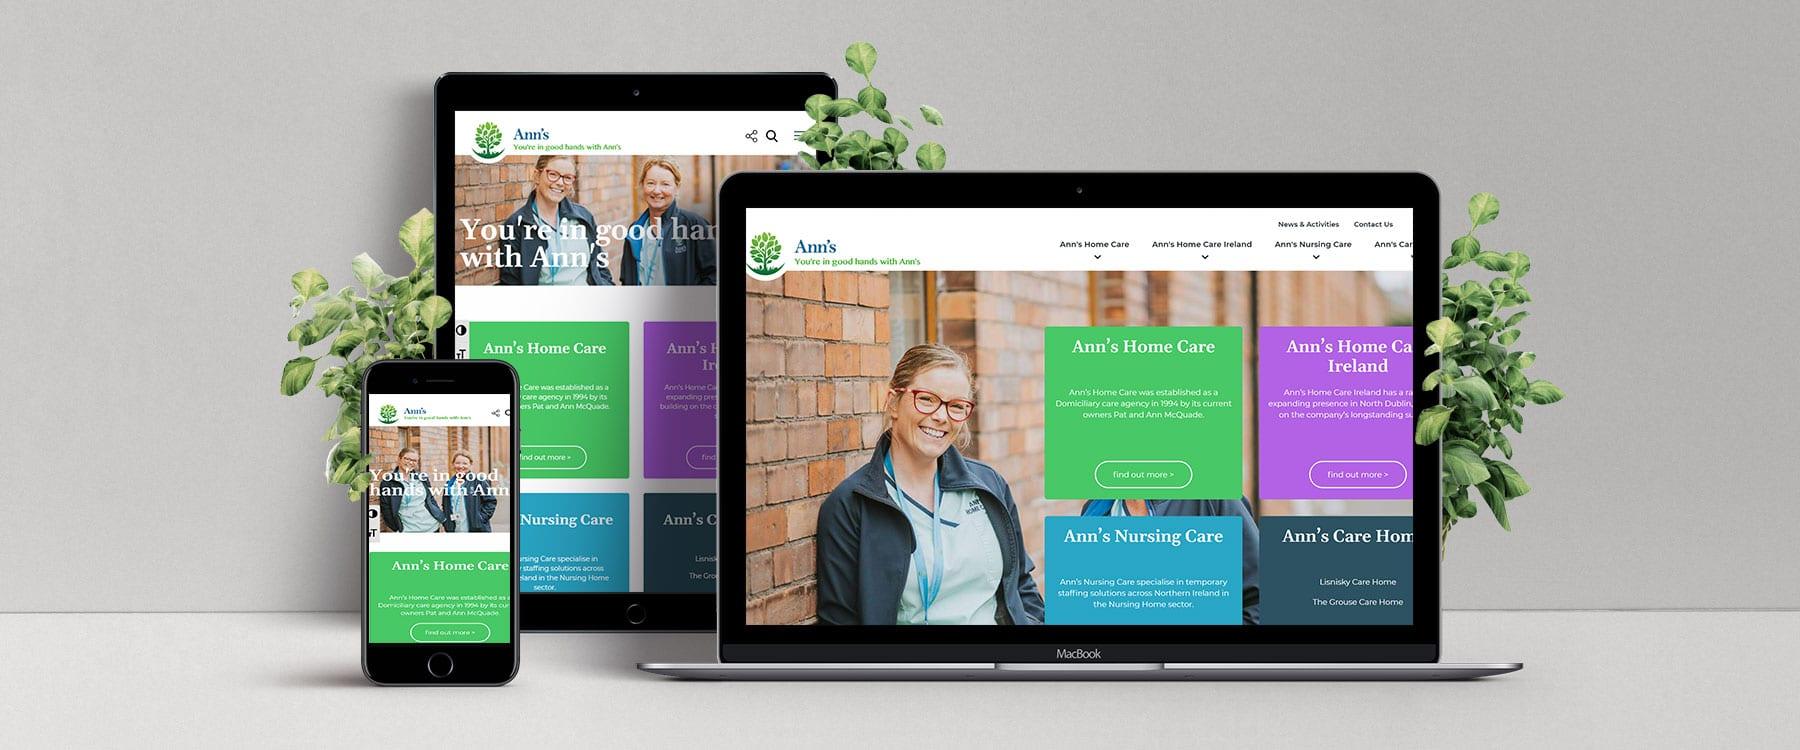 Modern New Website for Ann's Home Care Image